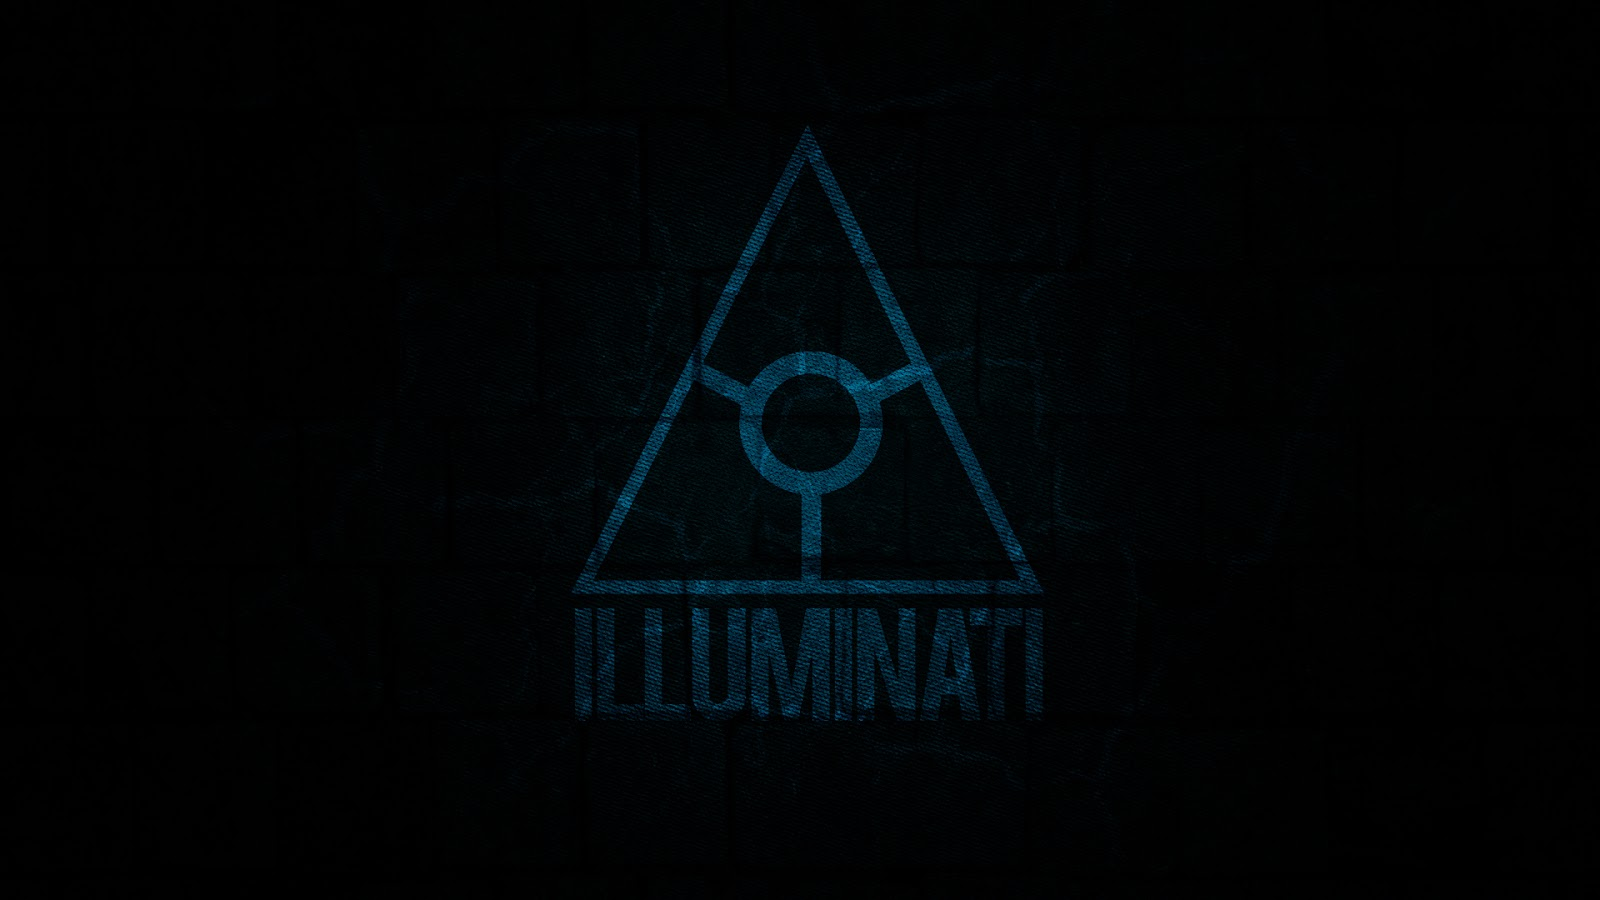 illuminati logos and symbols - photo #7